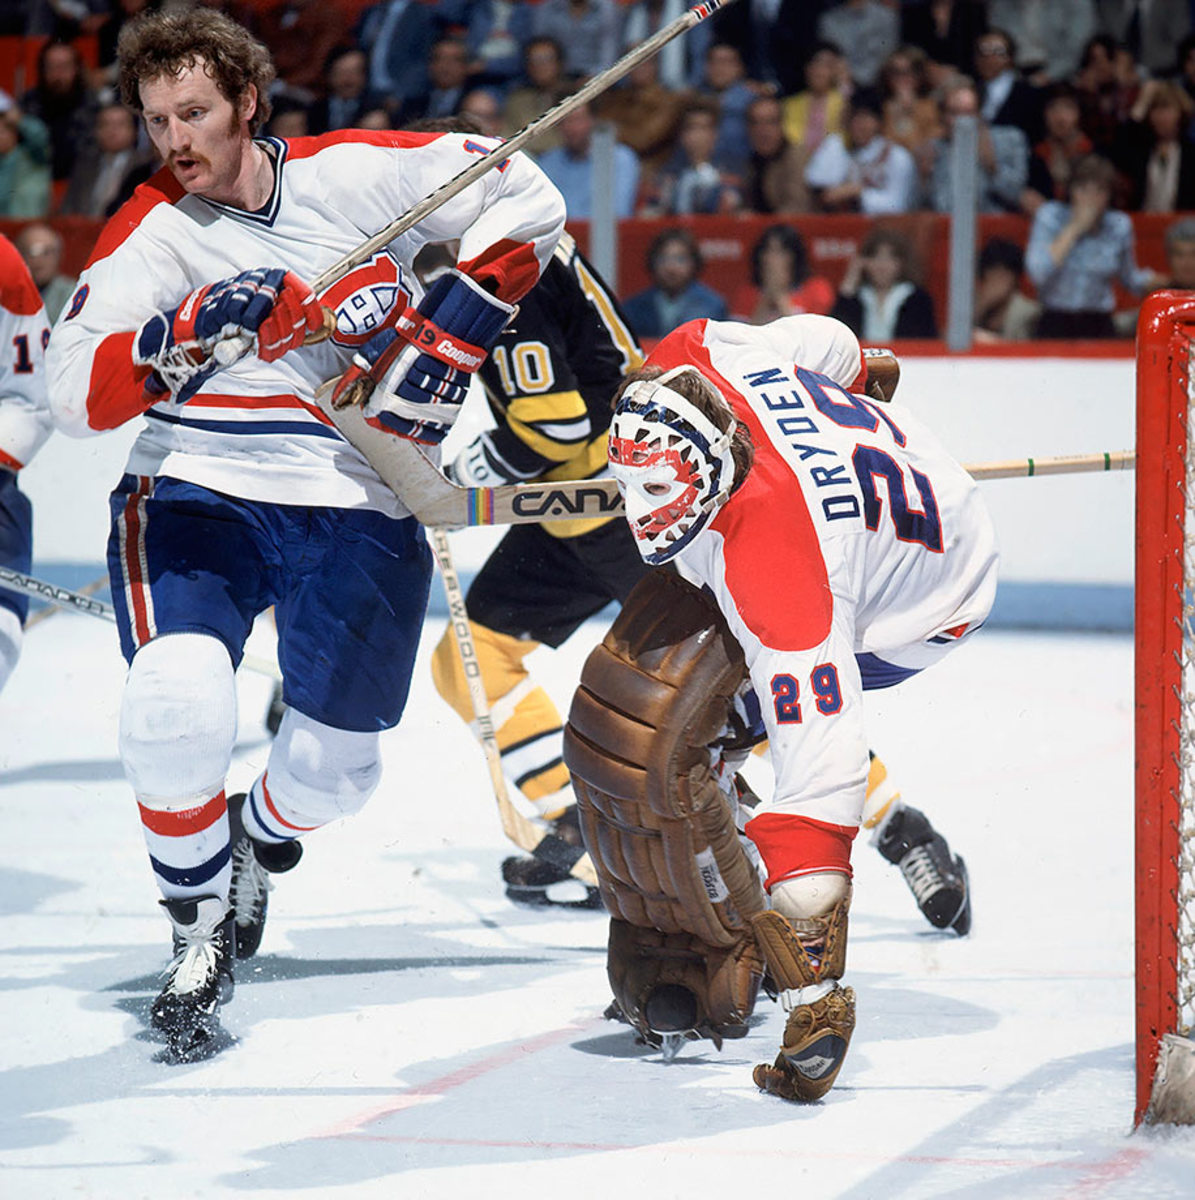 1978-Montreal-Canadiens-Larry-Robinson-Ken-Dryden-001308845.jpg